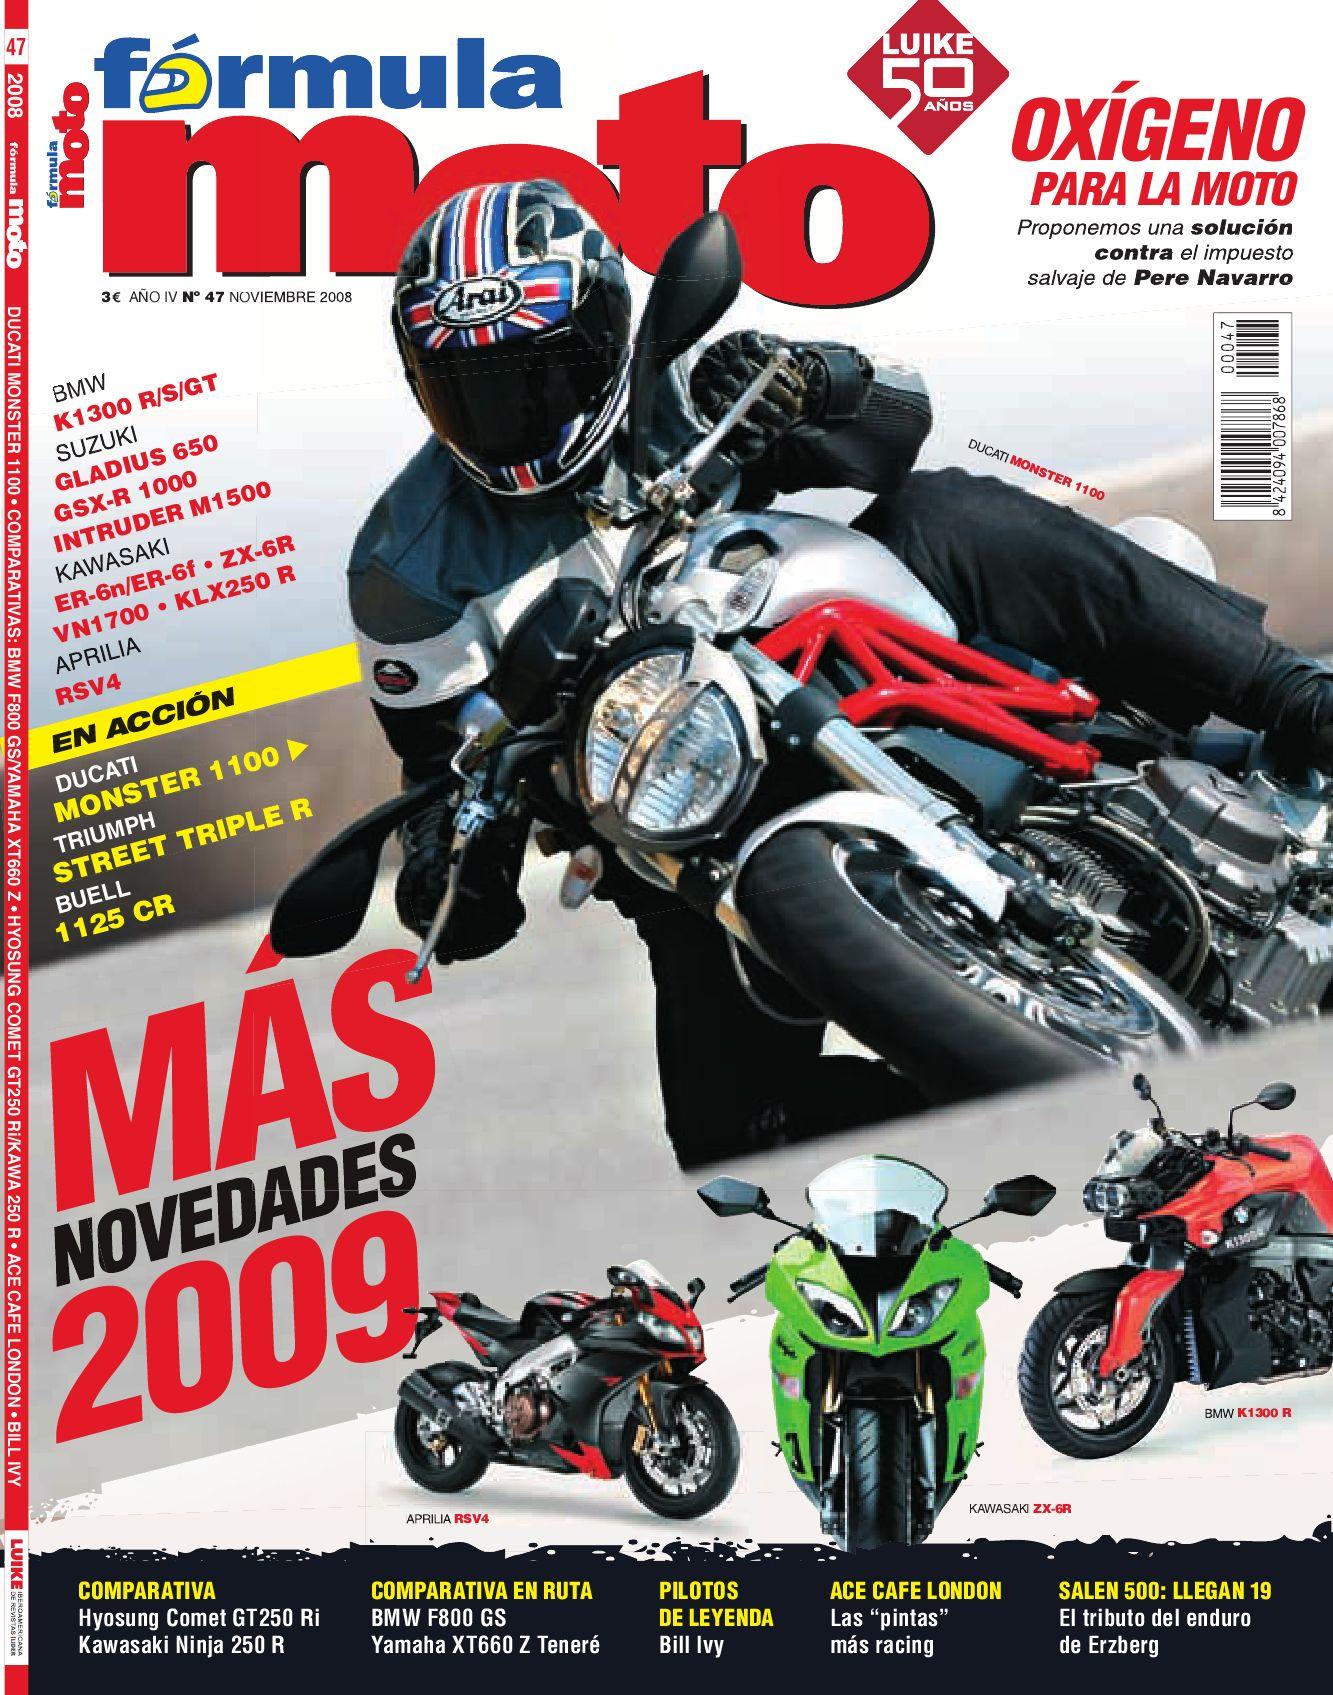 670539dfeb5 Fórmula Moto 47 by Jorge rguez - issuu